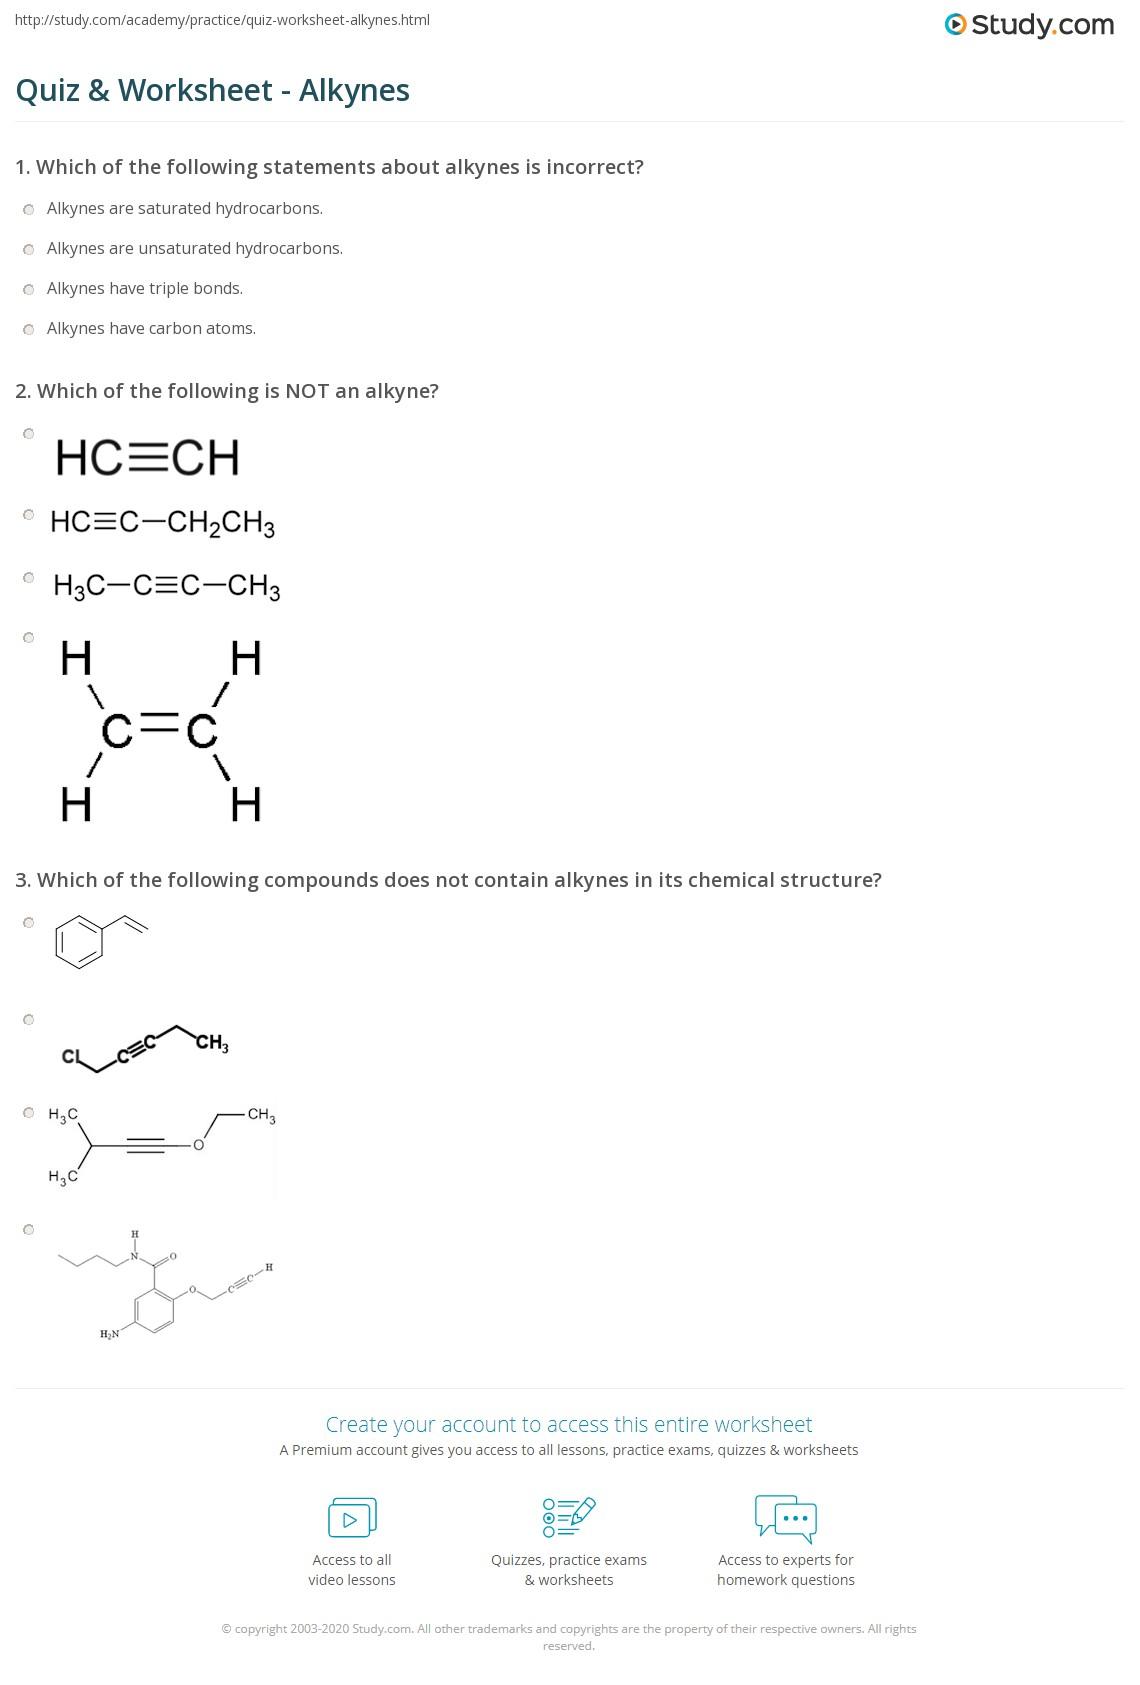 Quiz & Worksheet - Alkynes | Study.com